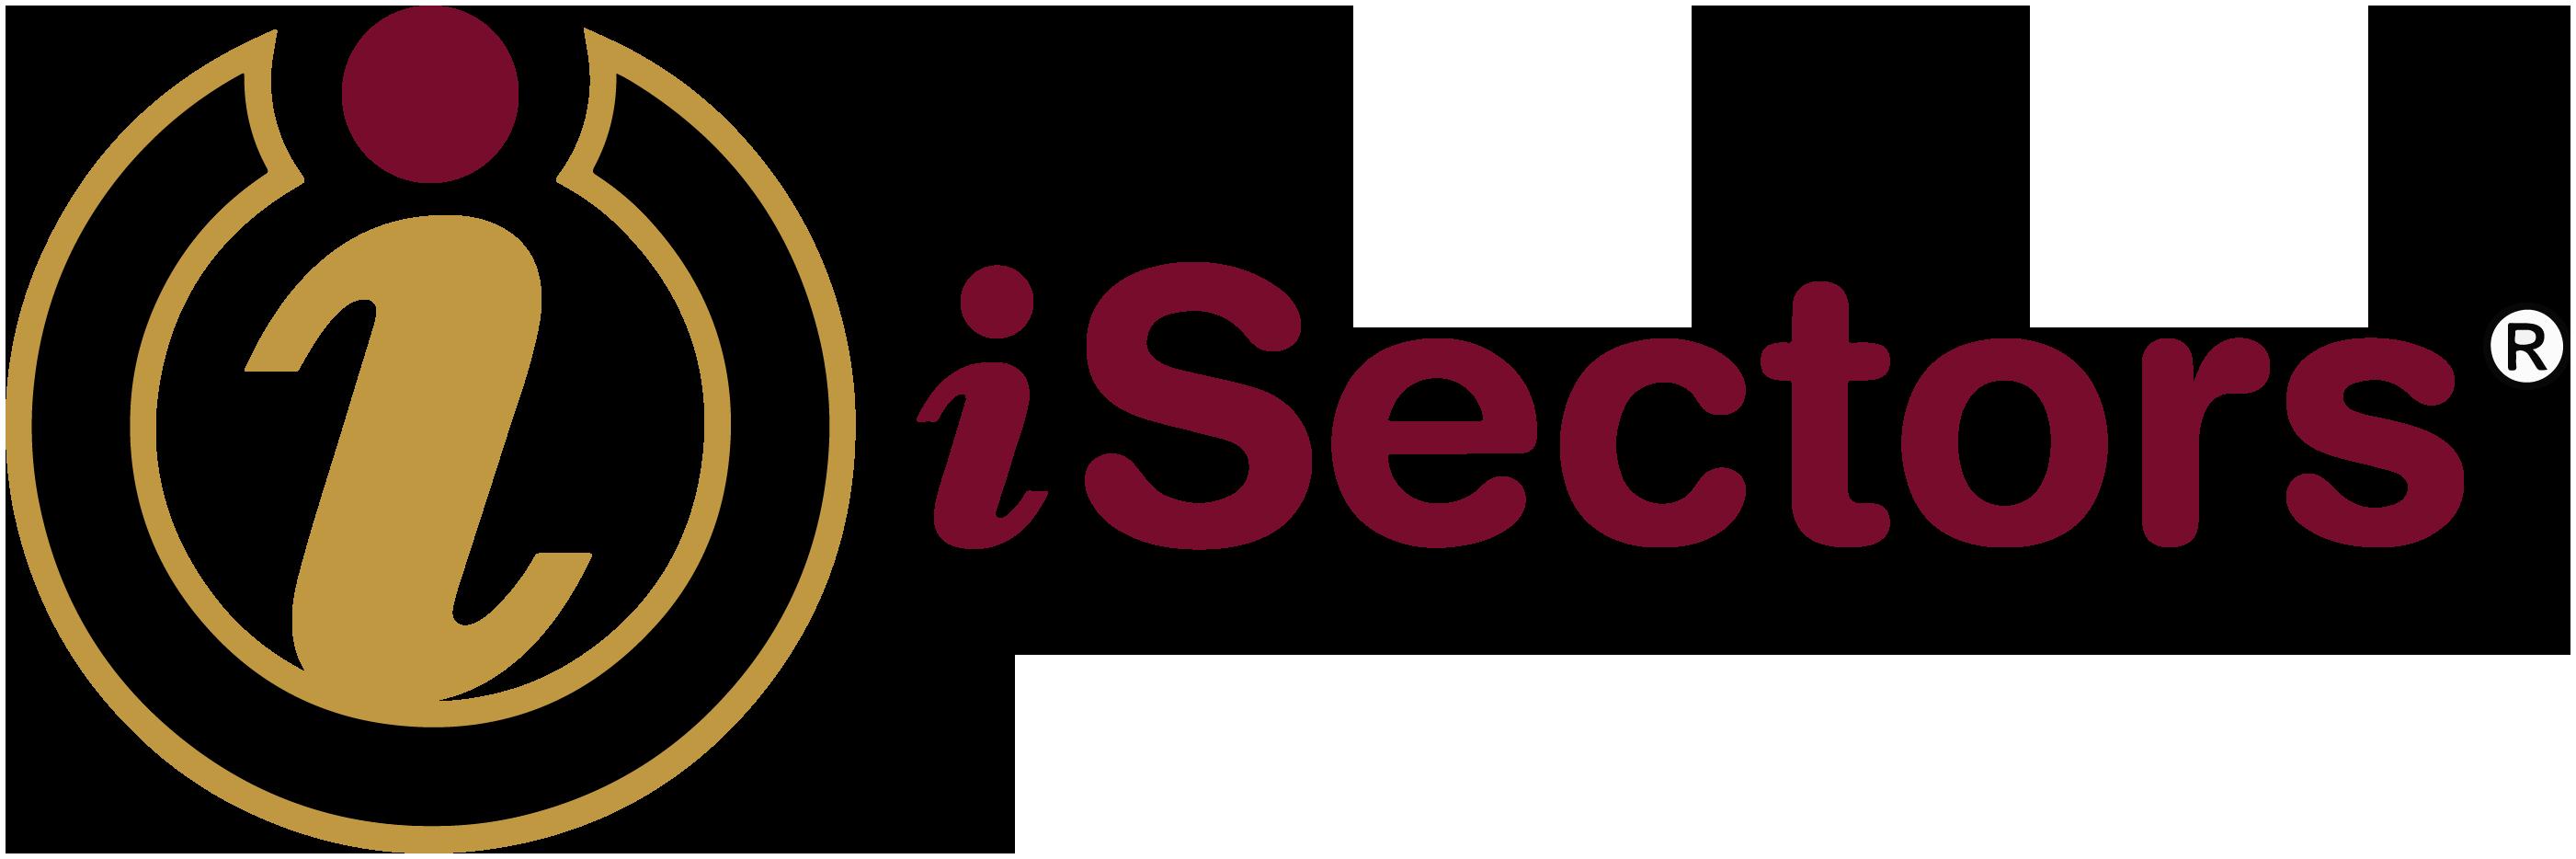 iSectors logo